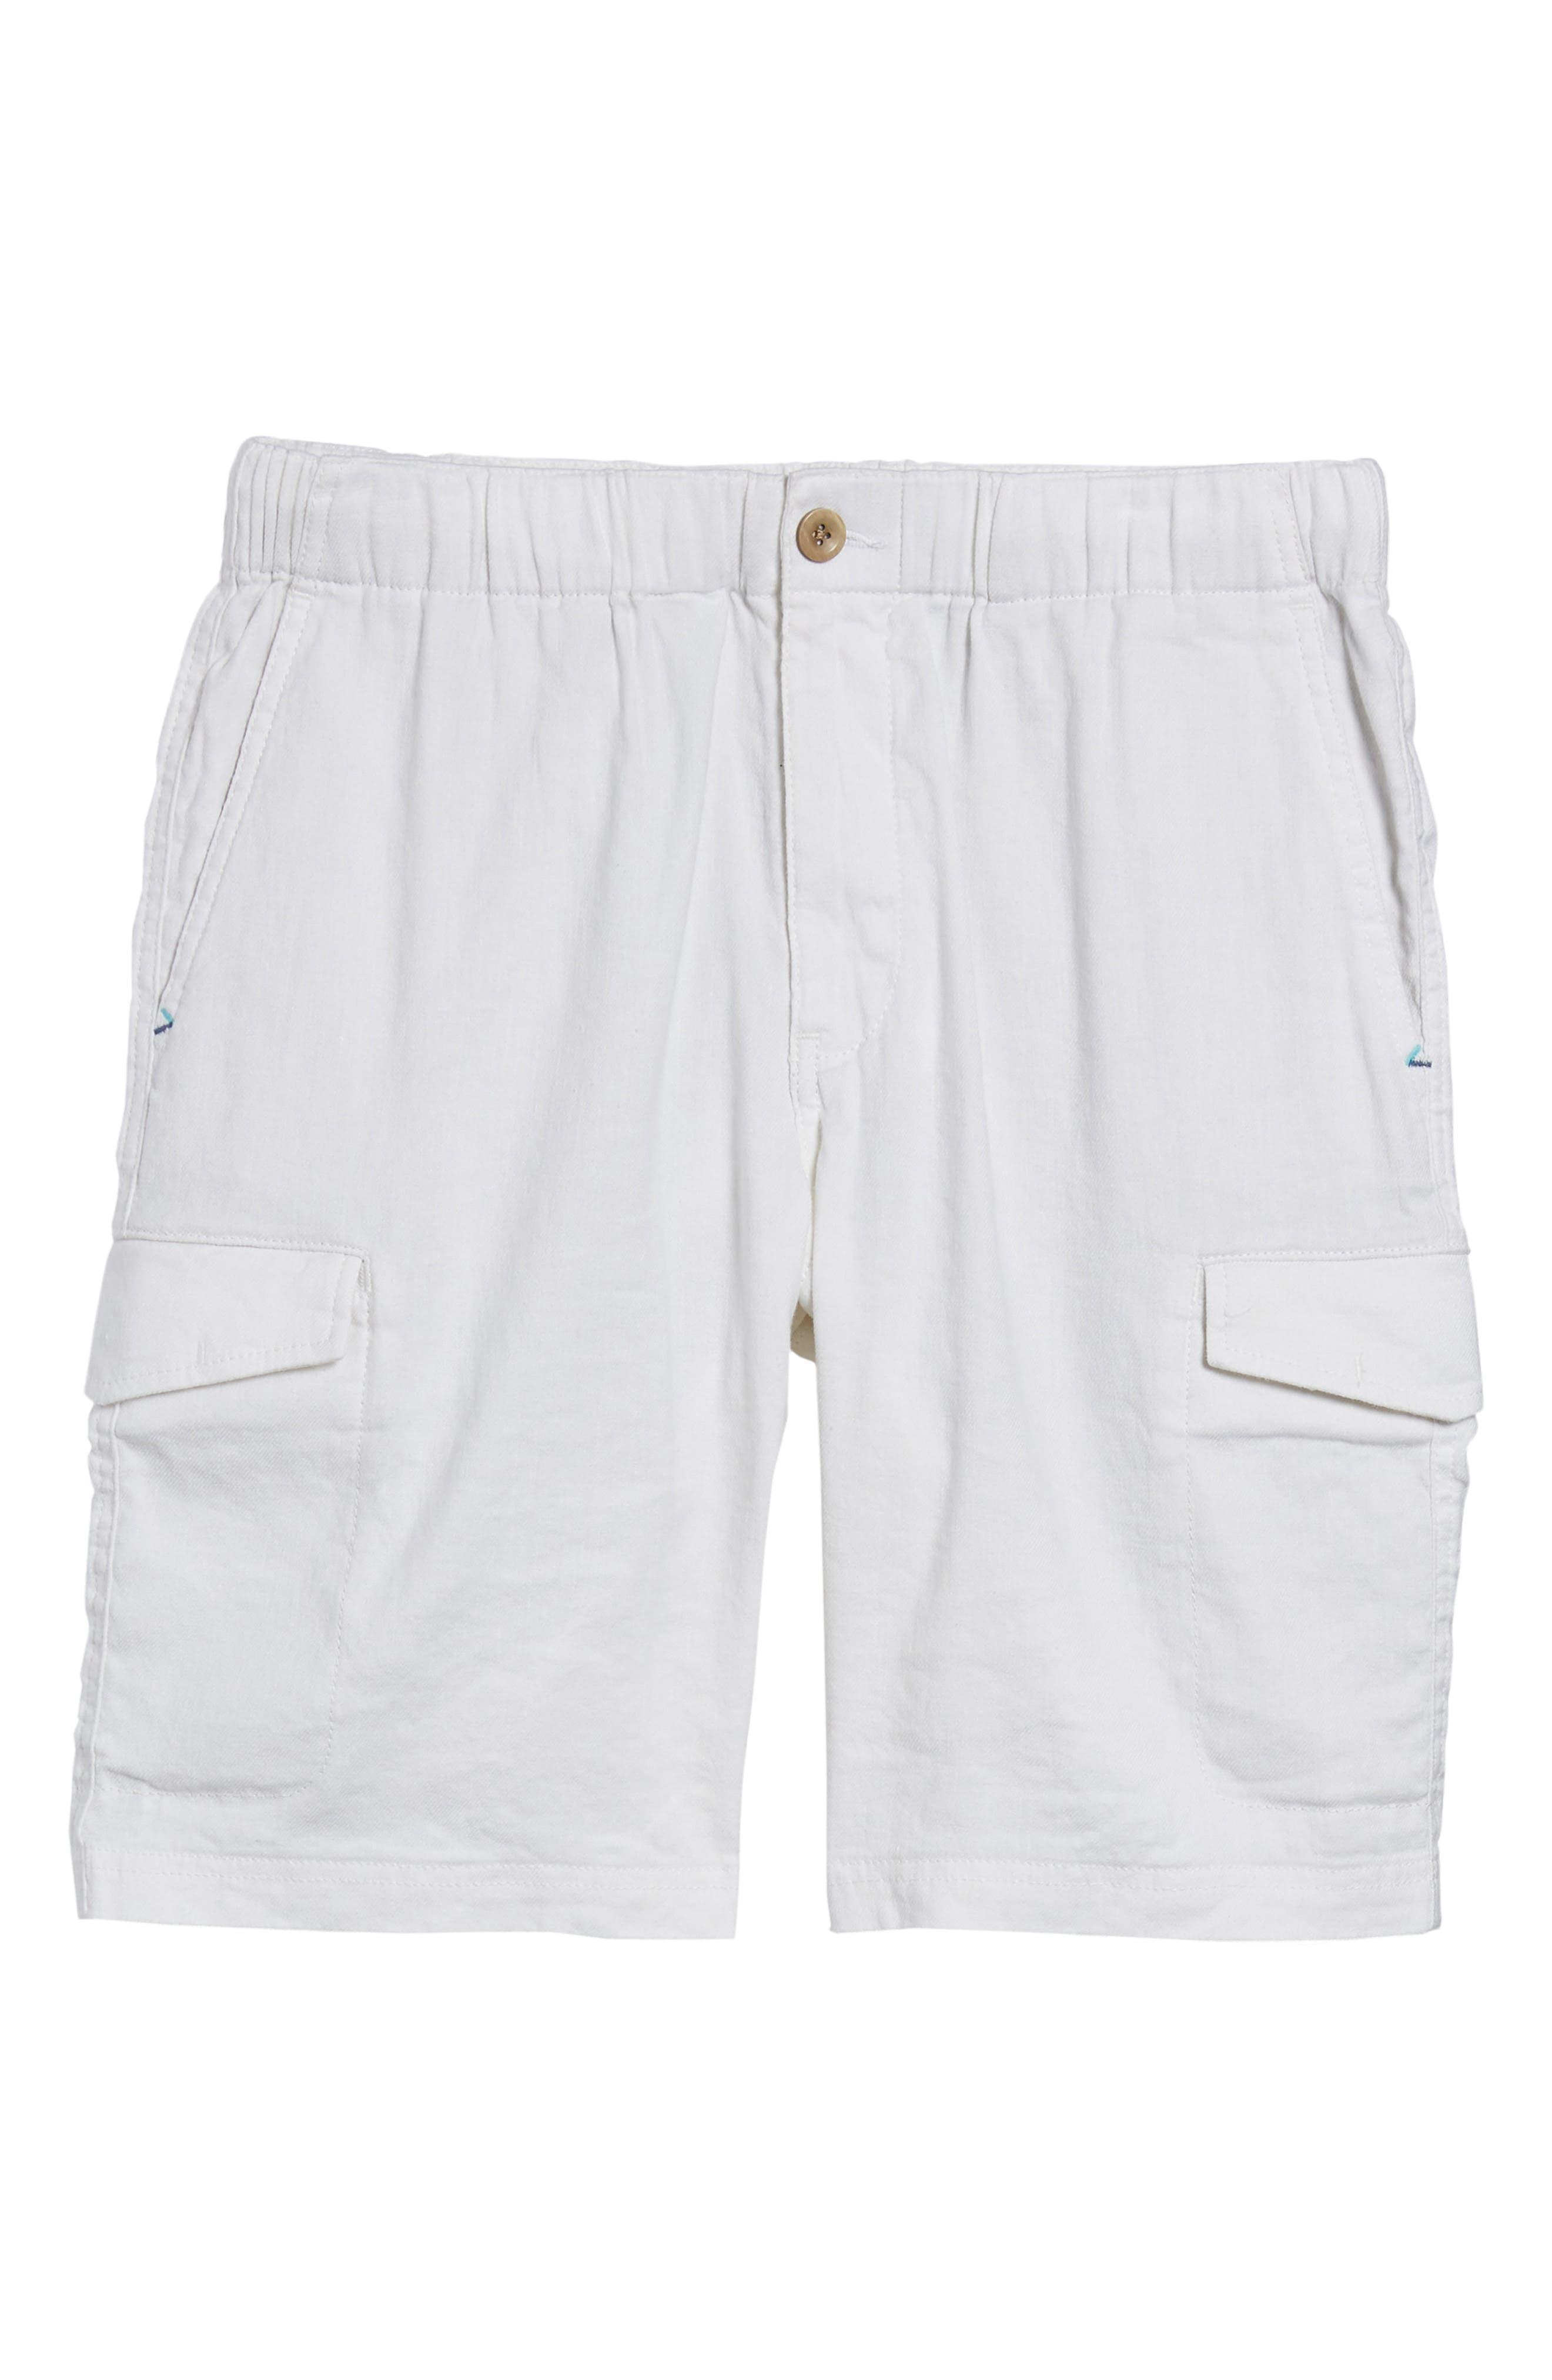 Beach Linen Blend Cargo Shorts,                             Alternate thumbnail 6, color,                             CONTINENTAL